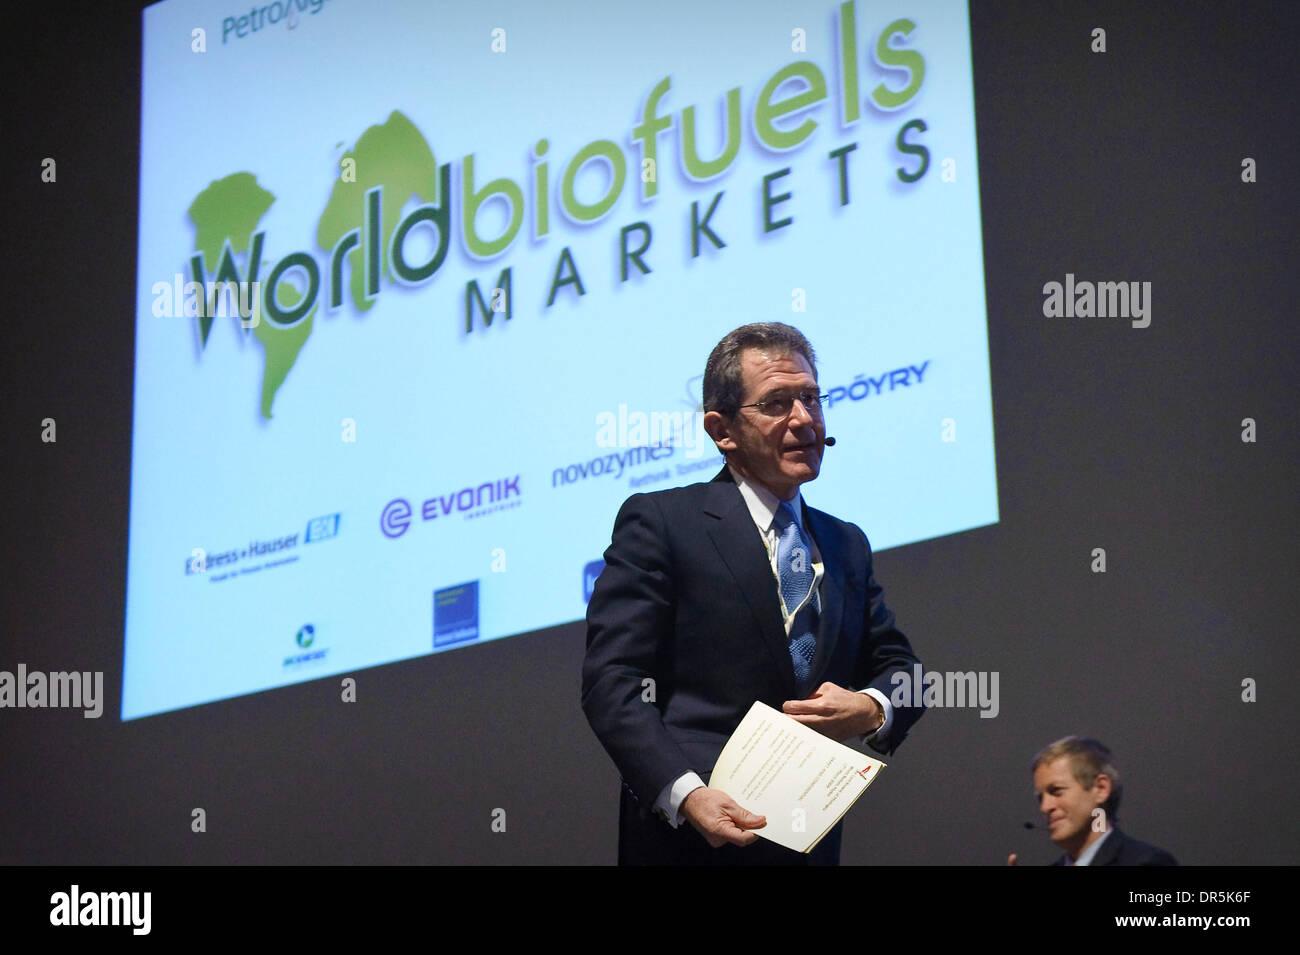 Mar 17, 2009 - Brussels, Belgium - Former BP CEO, LORD BROWNE during World Biofuels Markets Congress. (Credit Image: © Wiktor Dabkowski/ZUMA Press) - Stock Image